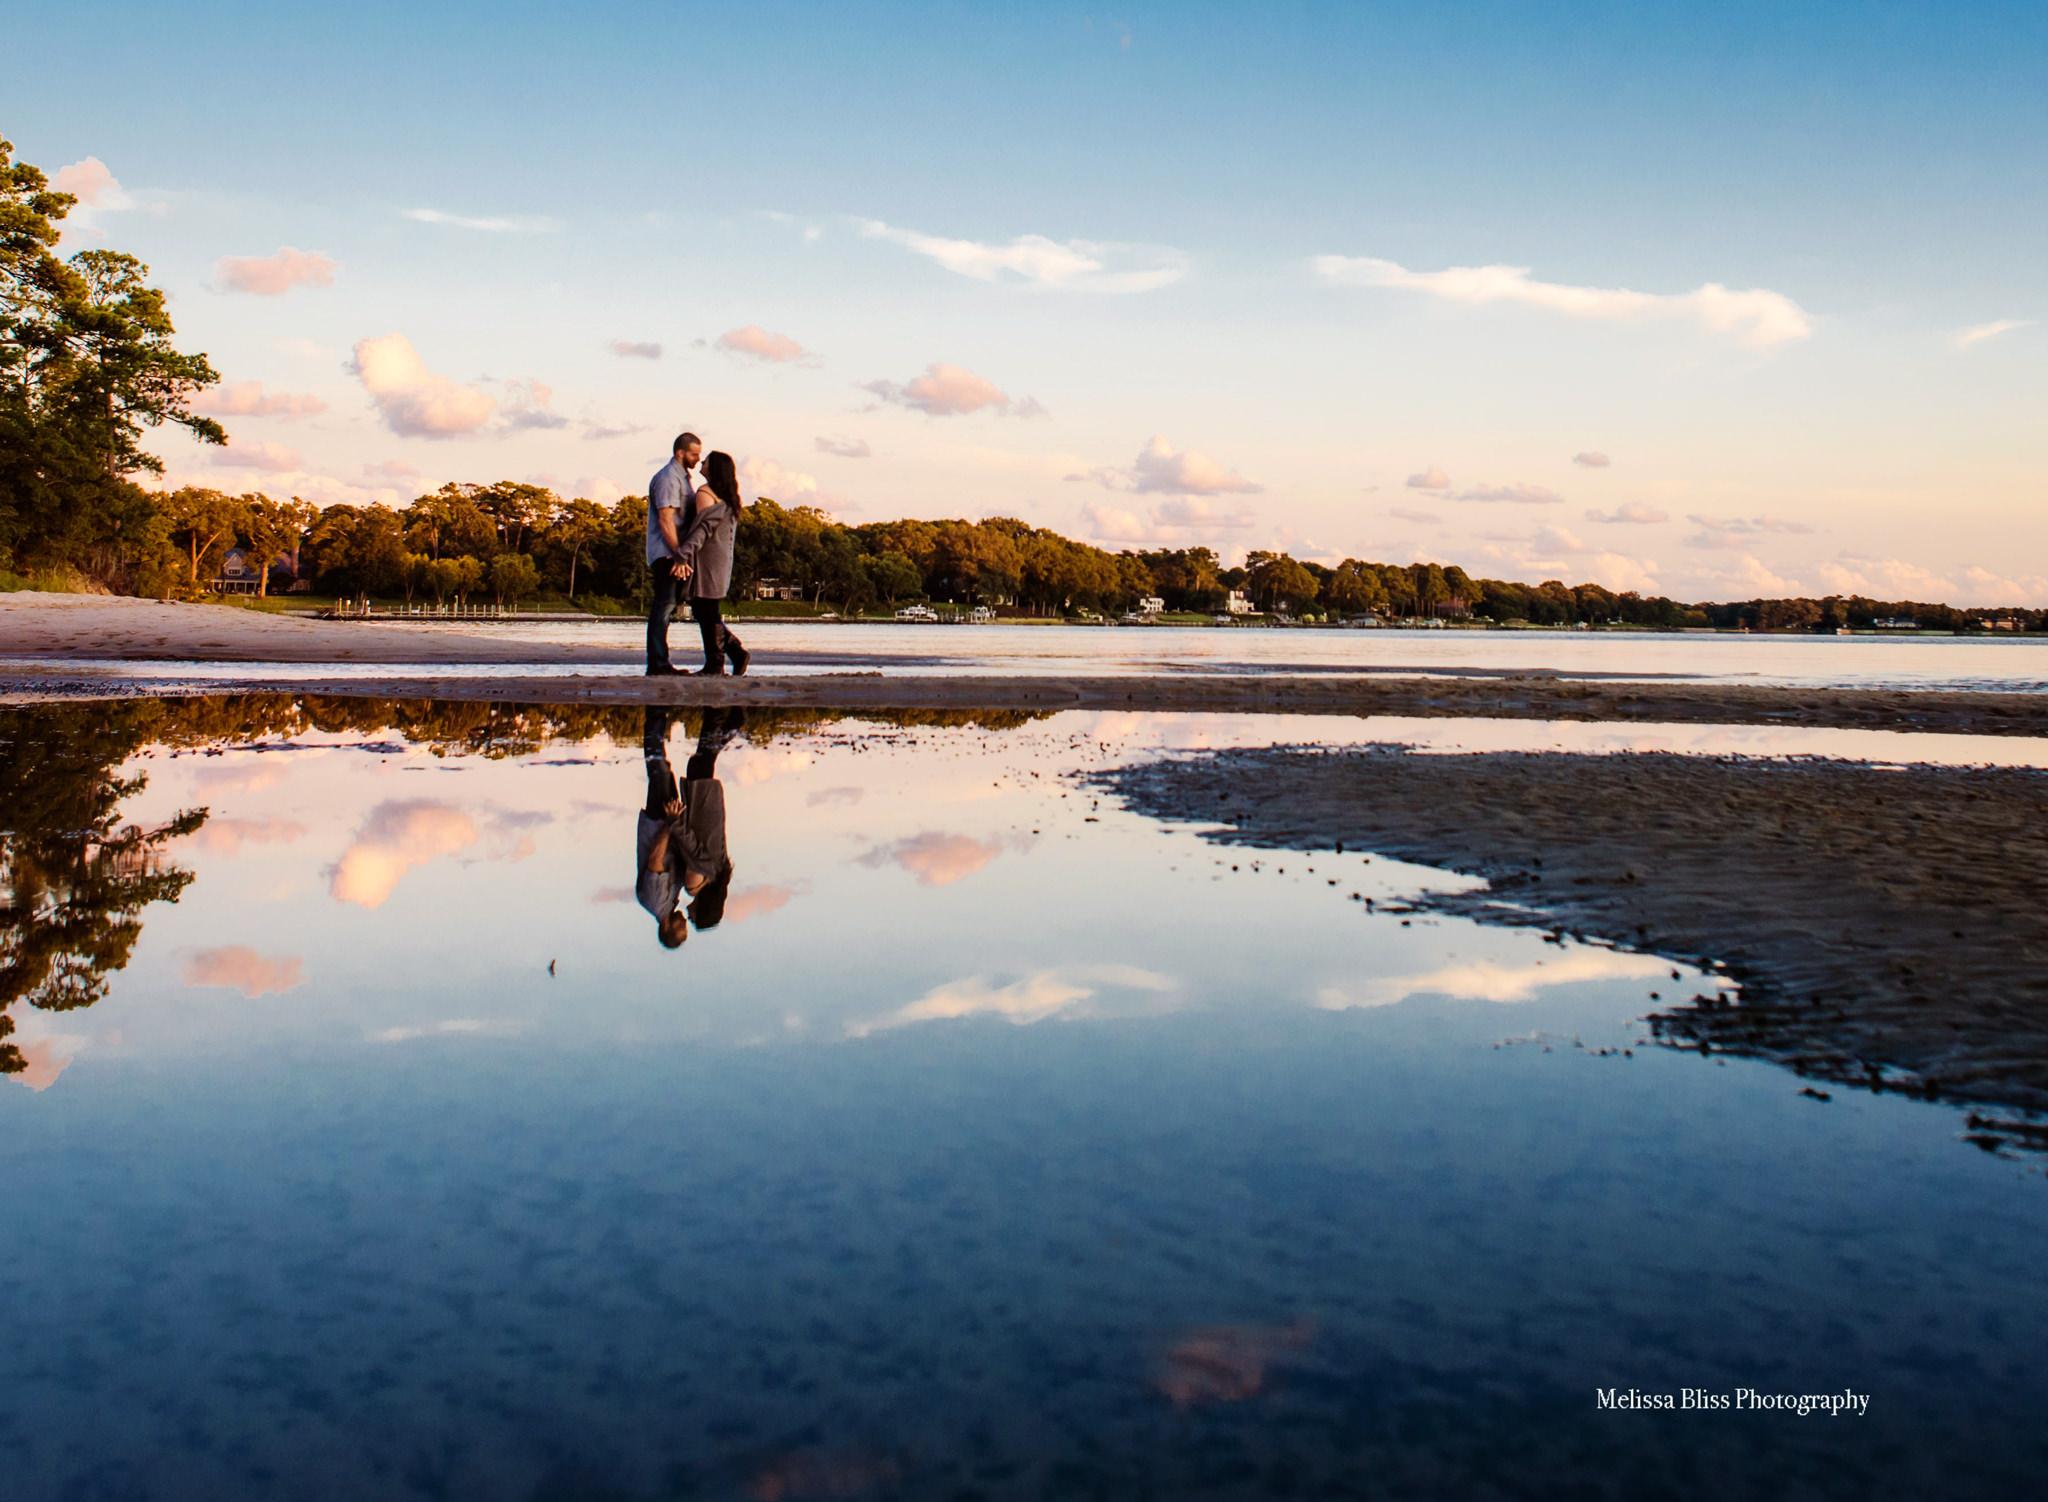 engagement-picture-couple-in-sunset-reflection-norfolk-virginia-beach-wedding-photographer-melissa-bliss-photography-destination-elopementscotland.jpg